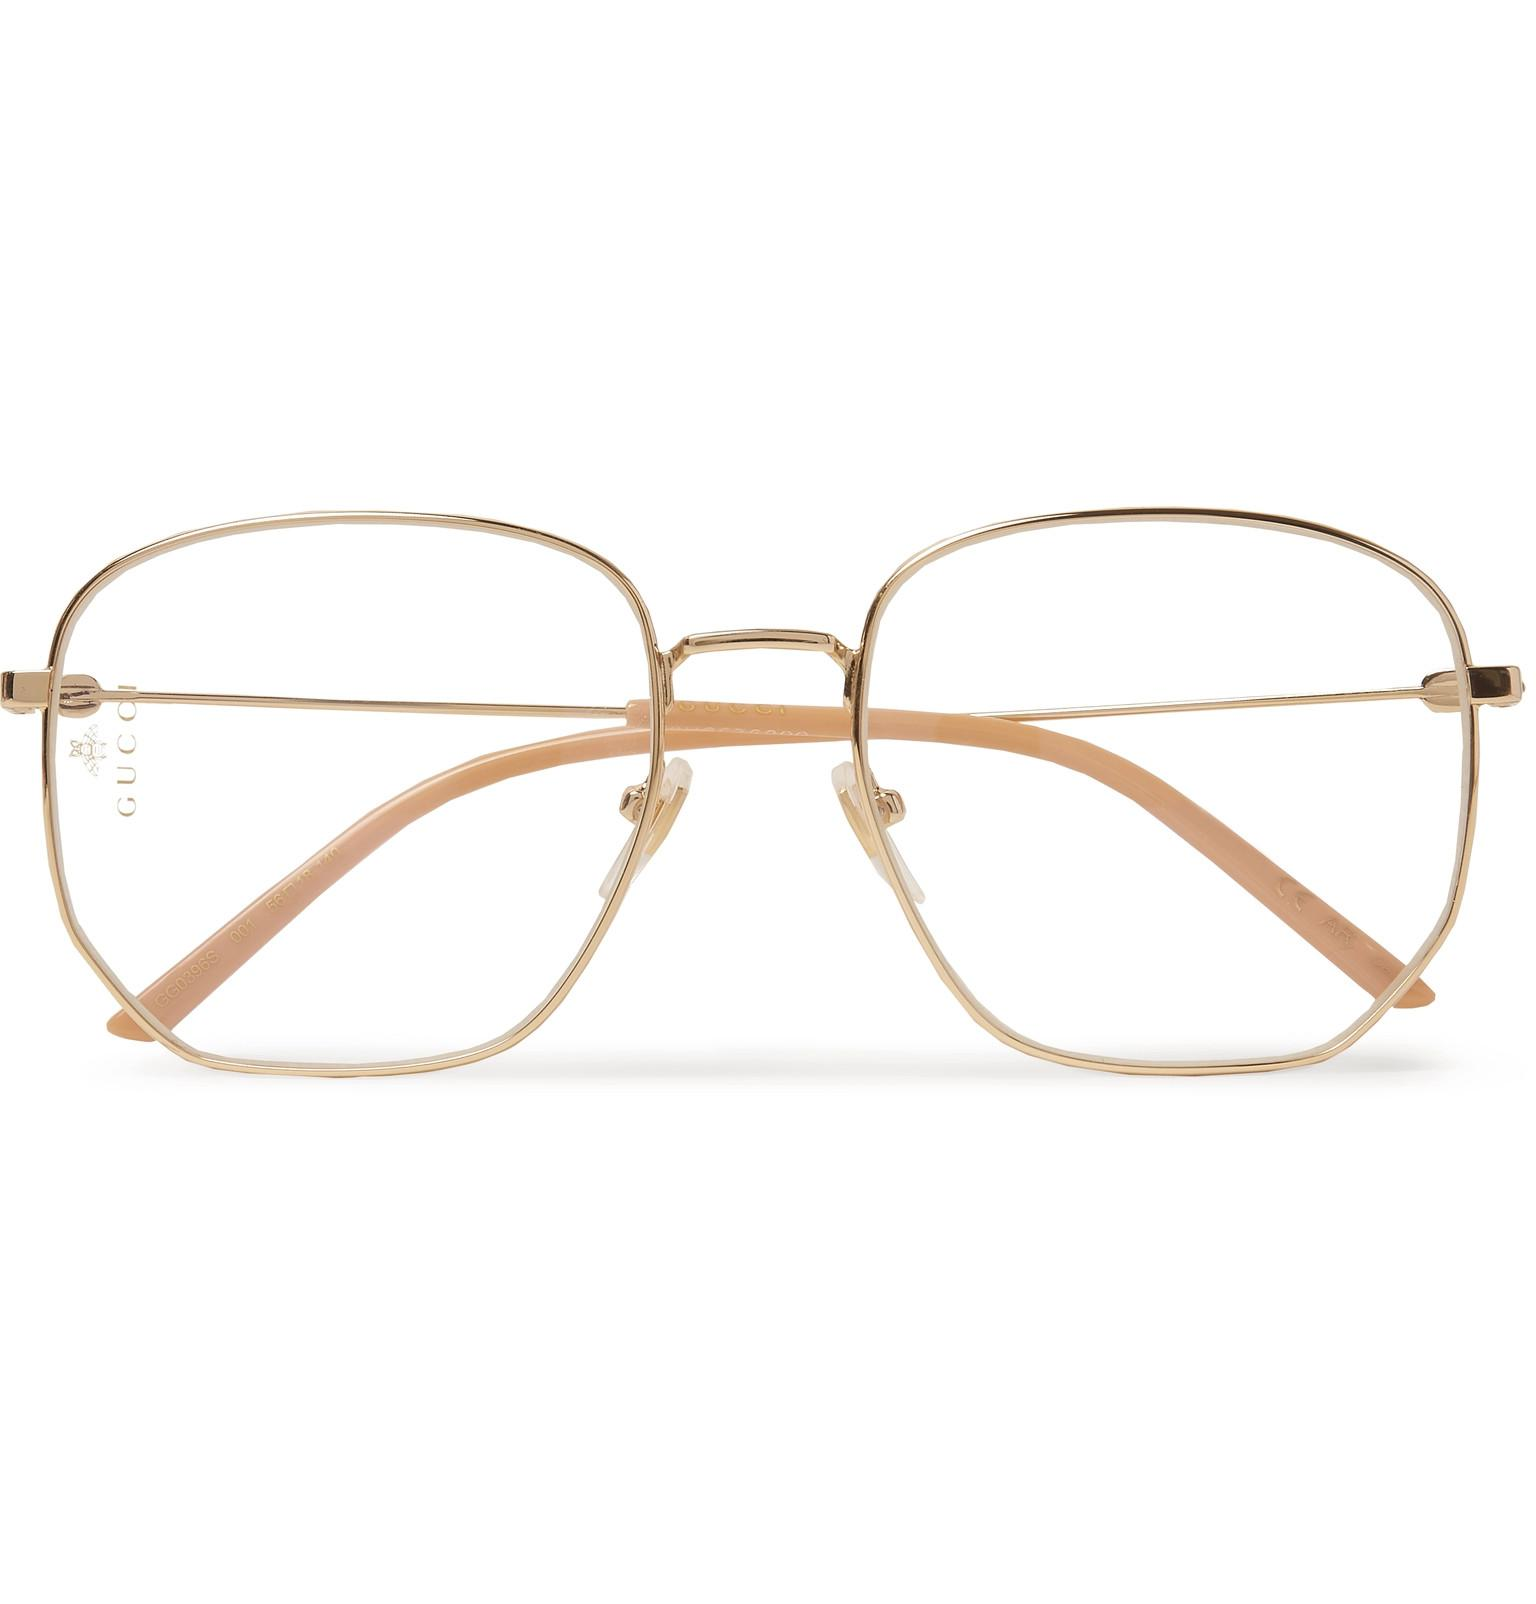 c1b9d2c95d Gucci - Metallic Hexagon-frame Gold-tone Optical Glasses for Men - Lyst.  View fullscreen